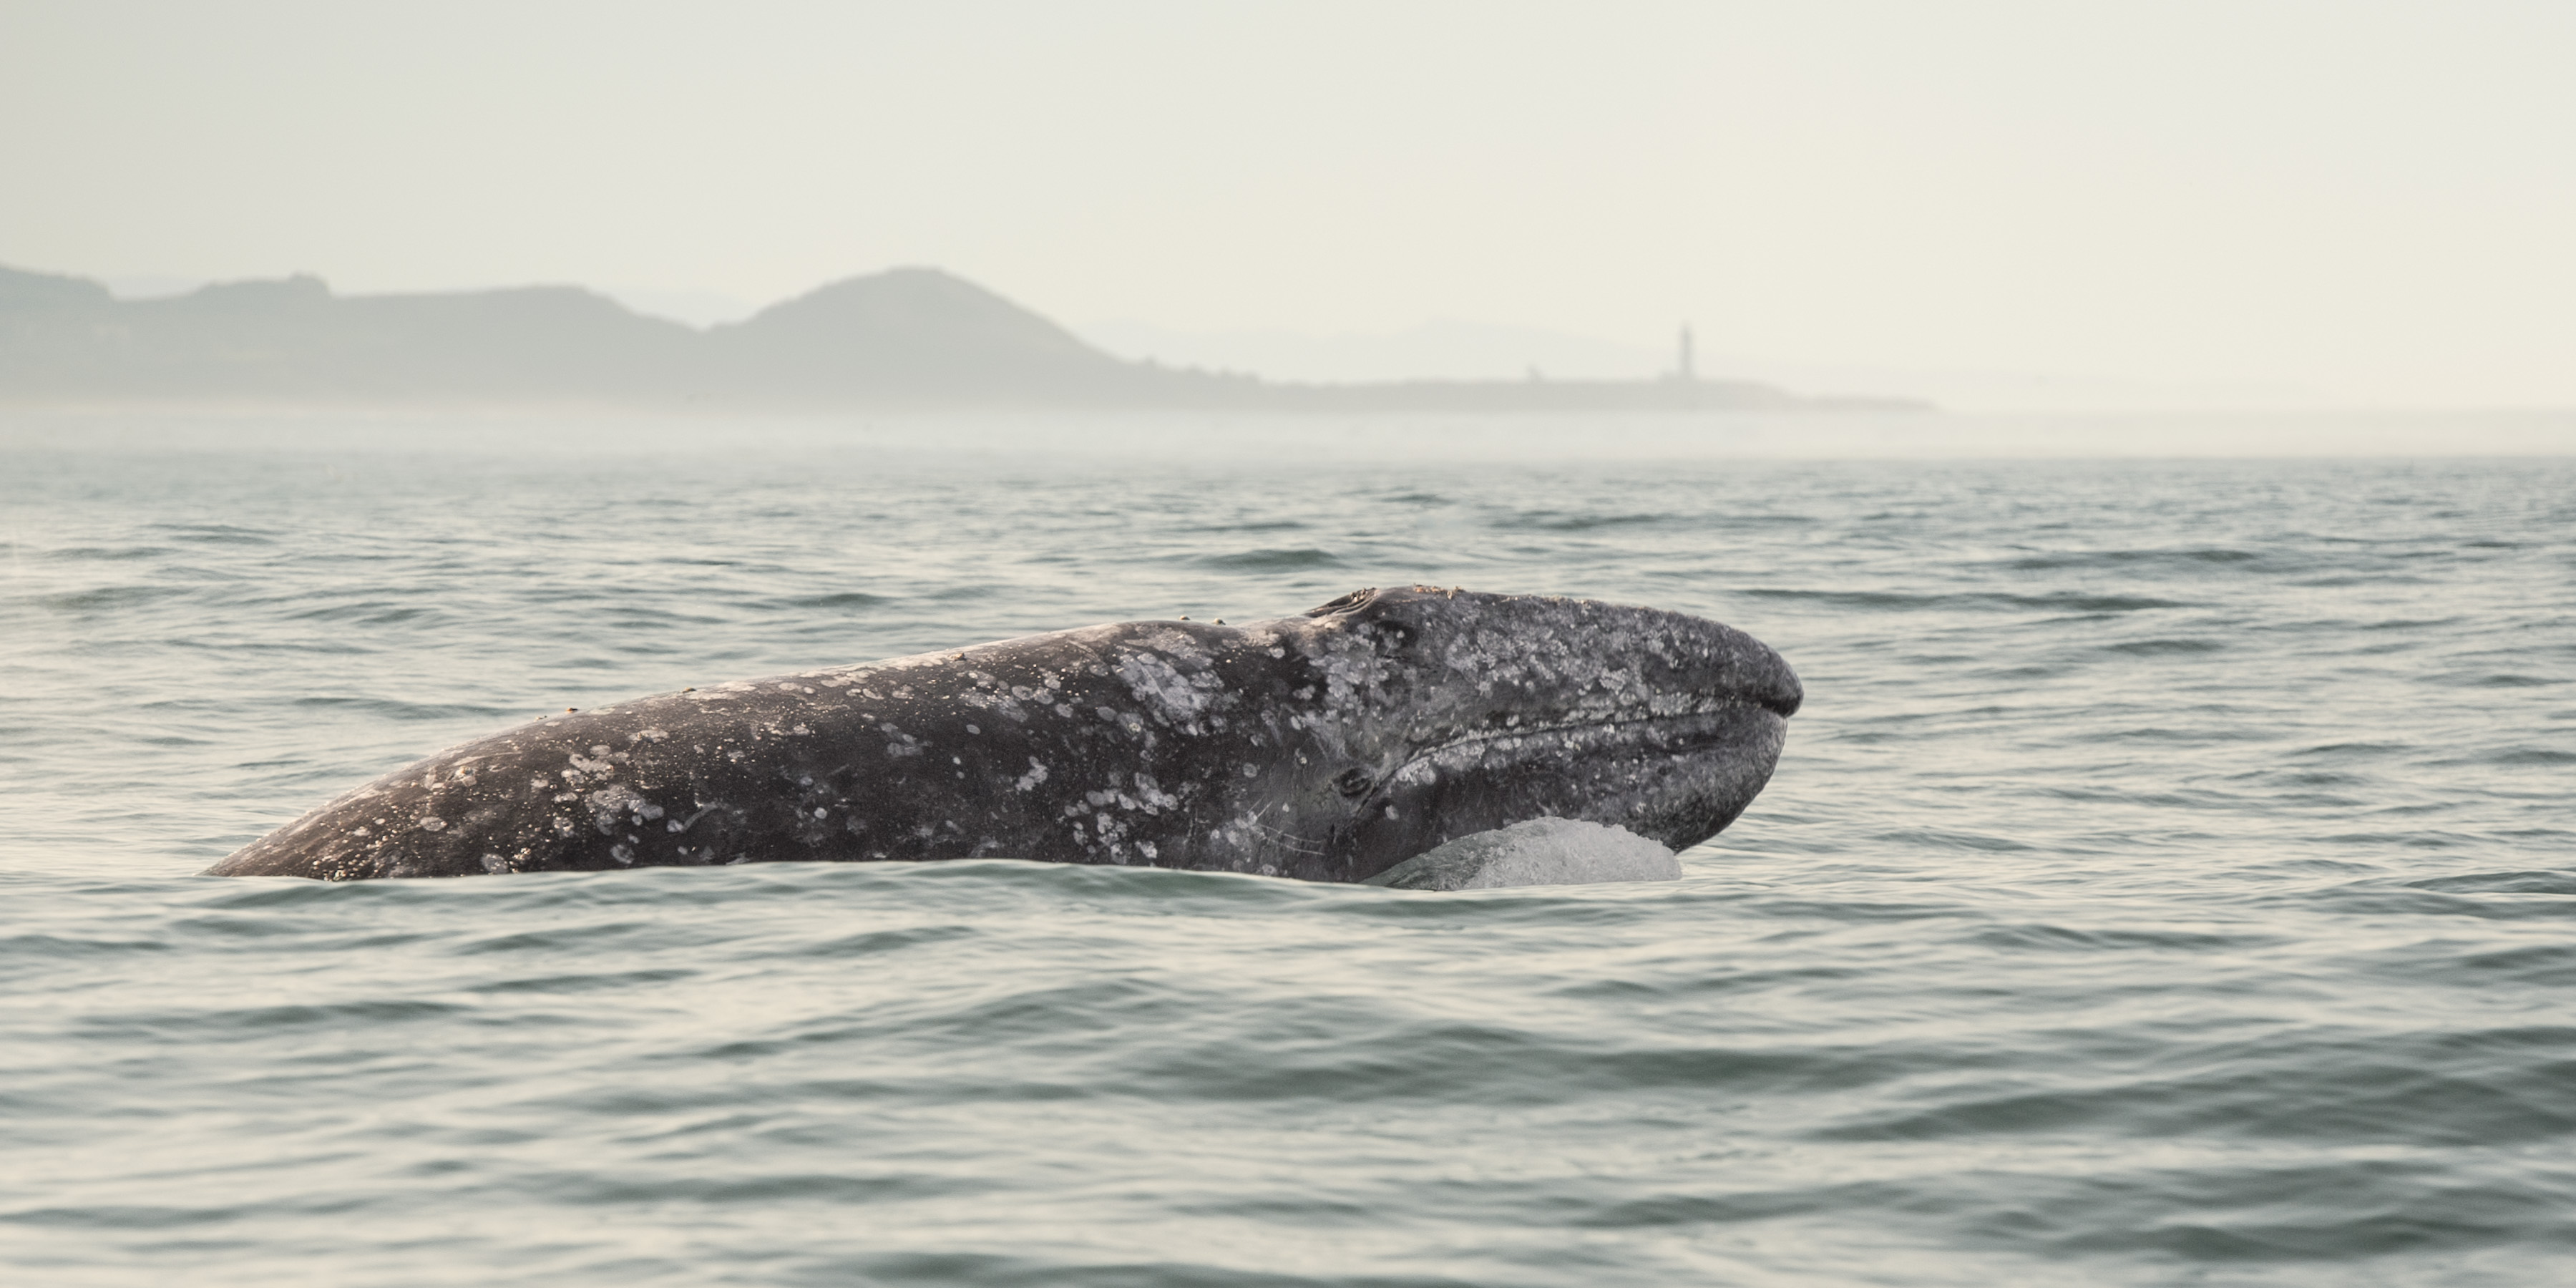 whale watching oregon coast 2020